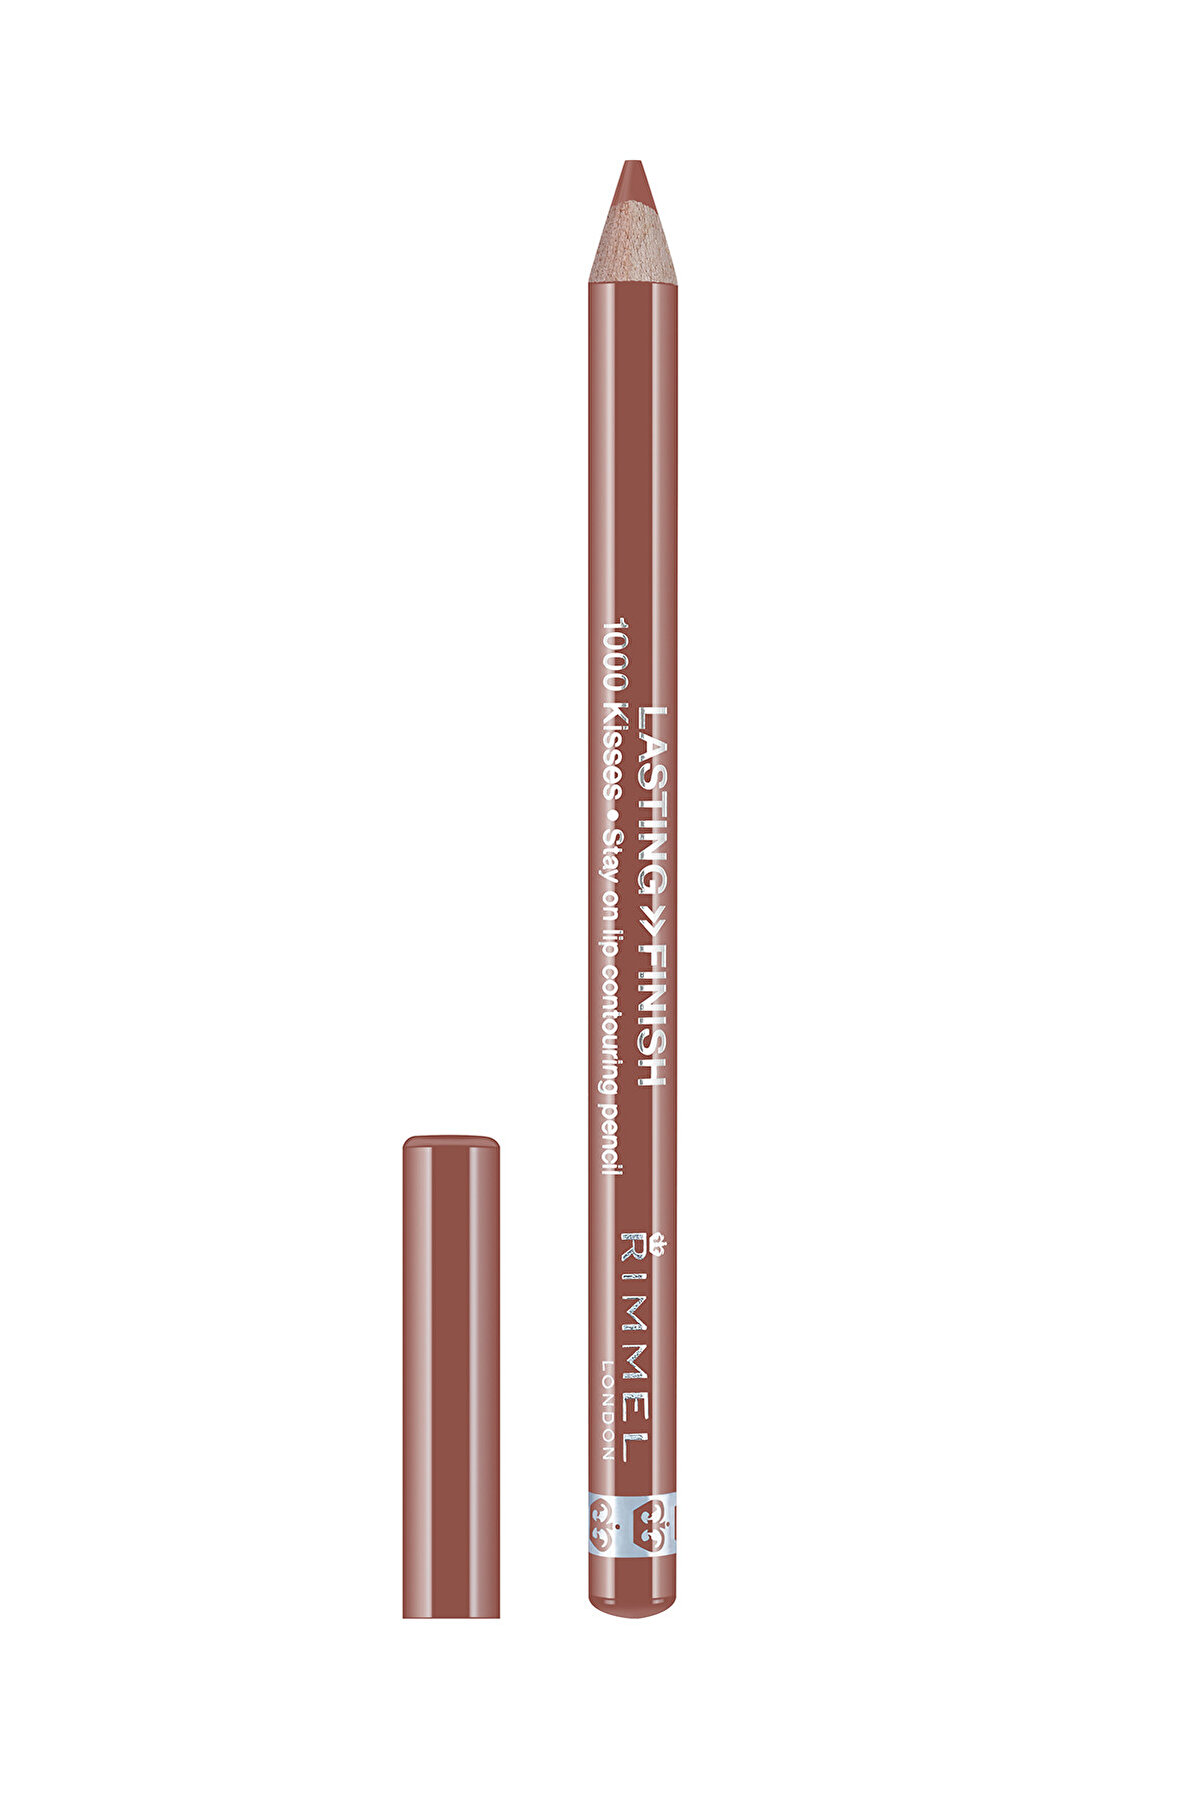 Rimmel London Dudak Kalemi - Lasting Finish 1000 Kisses Lip Liner 050 Tiramisu 1,2 g 5012874027620